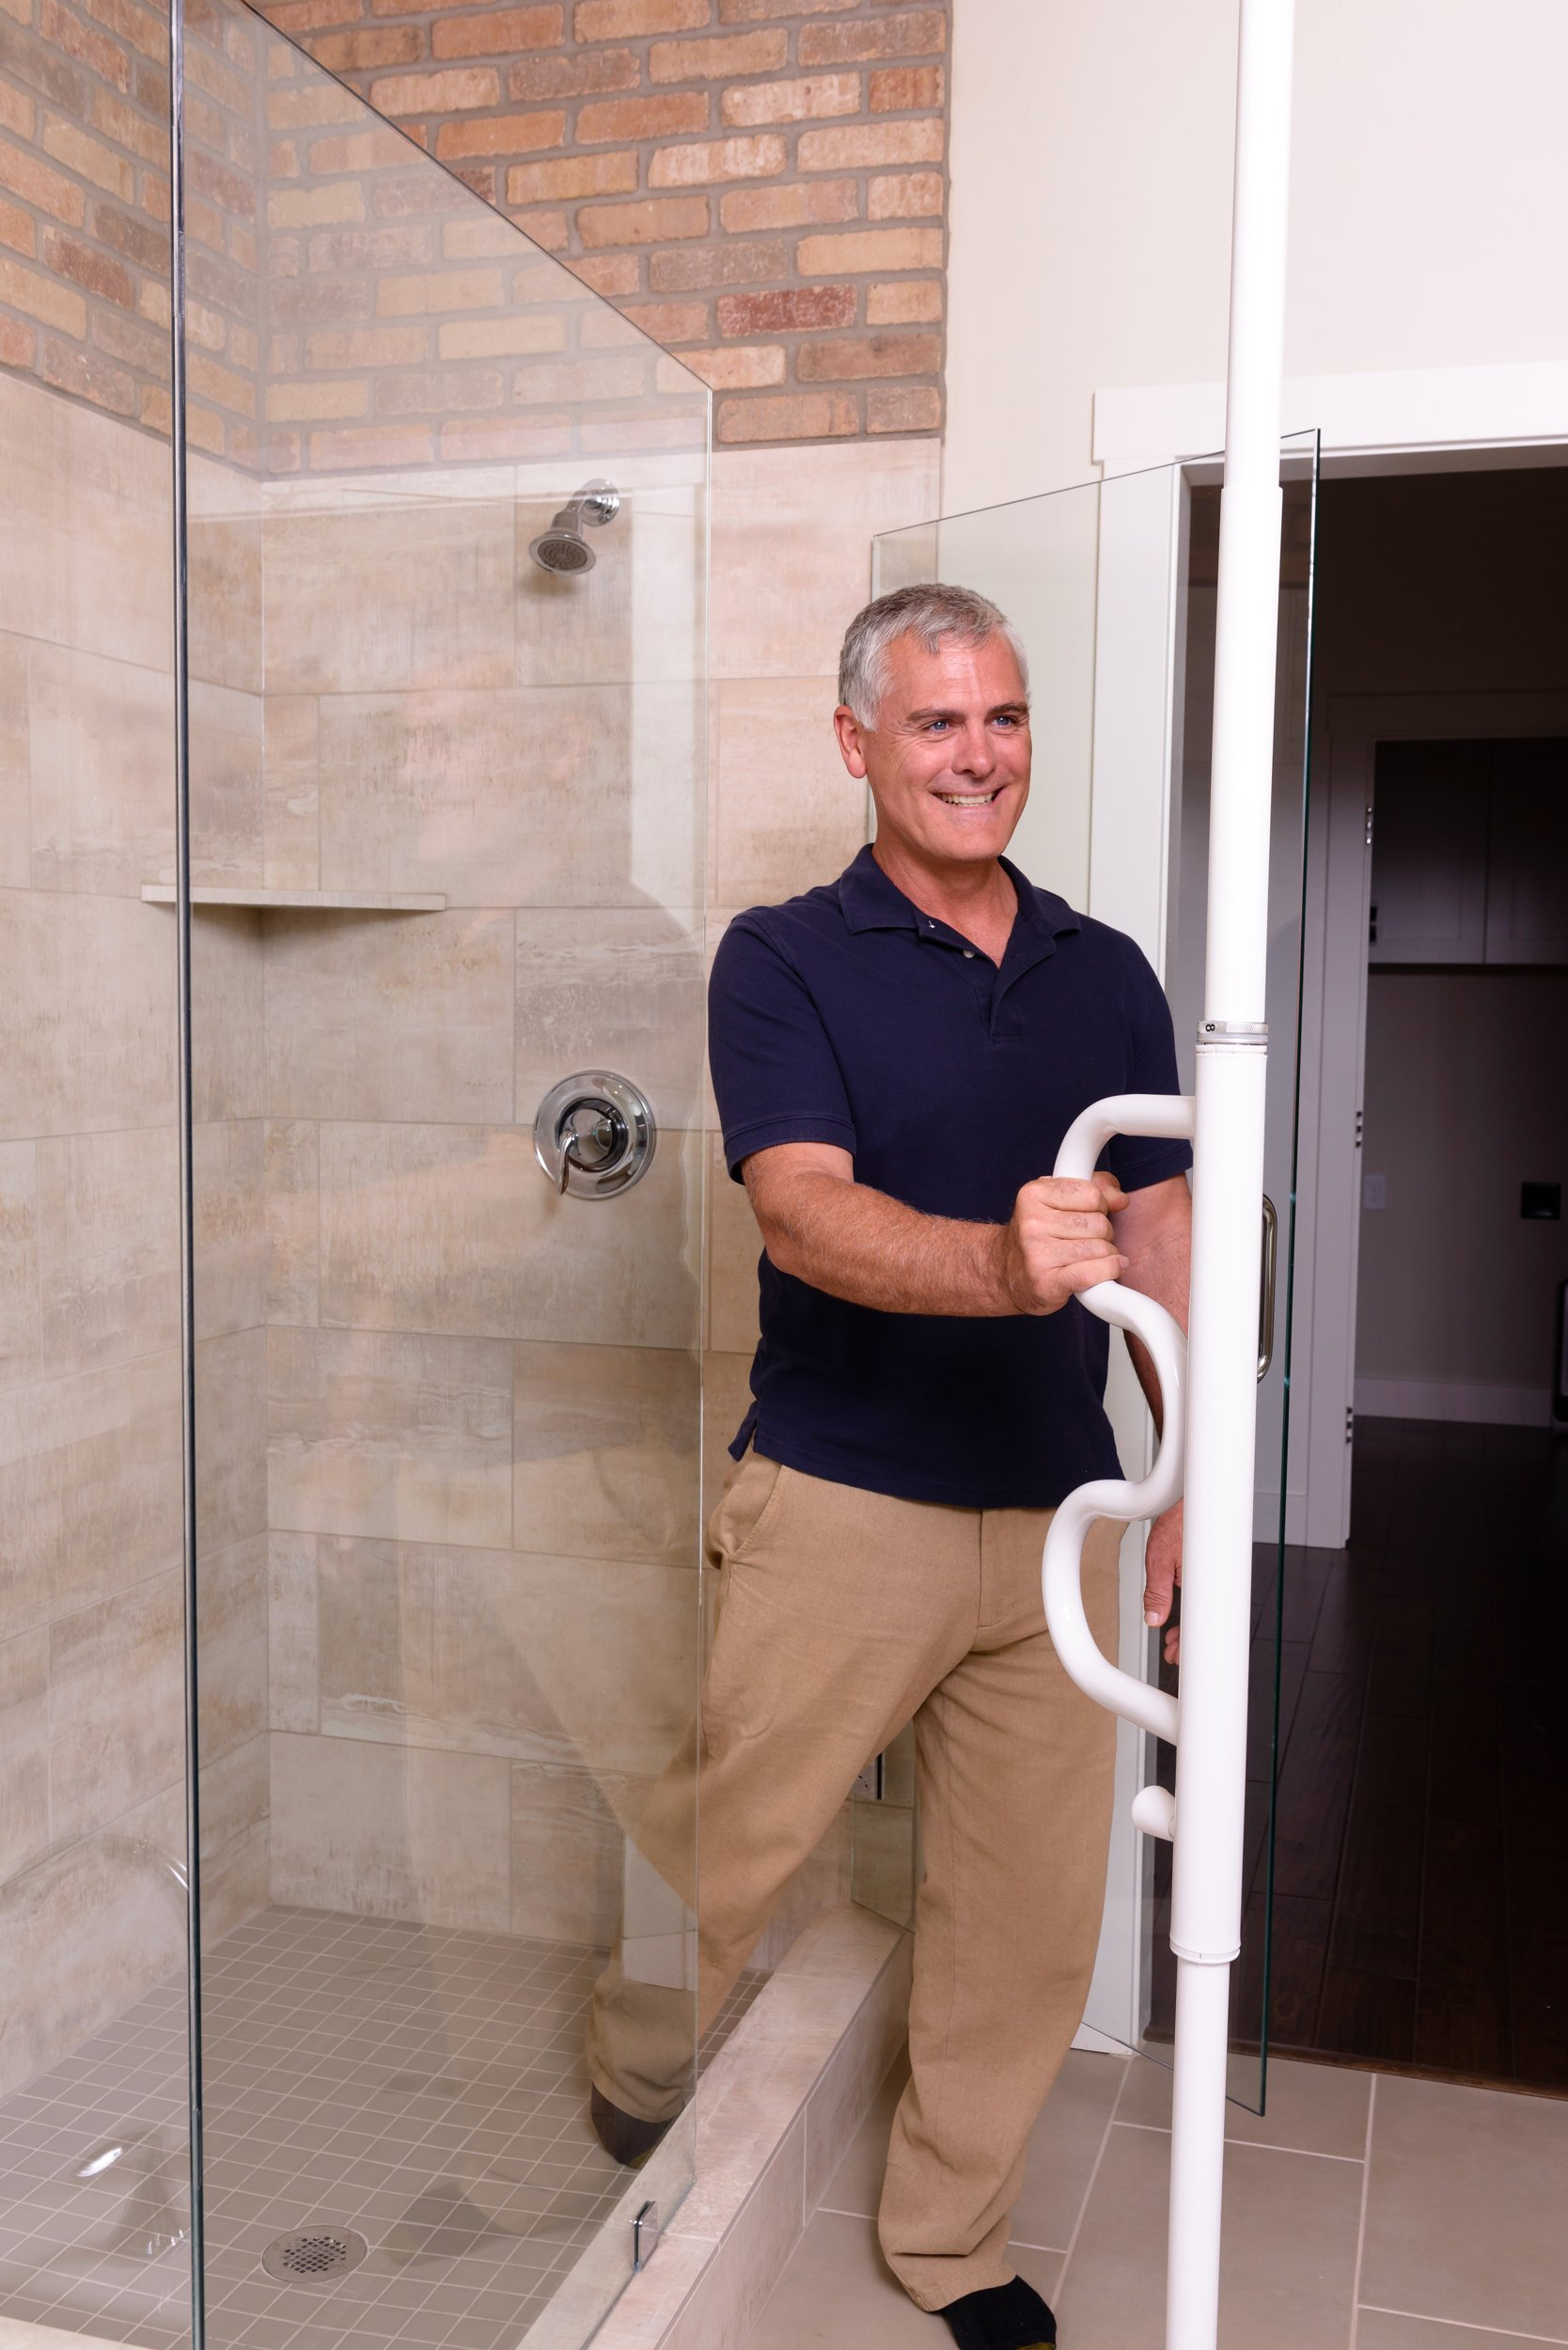 Stander Security Pole & Curve Grab Bar - Elderly Tension Mounted Transfer Pole + Bathroom Assist Grab Bar - Iceberg White by Stander (Image #4)